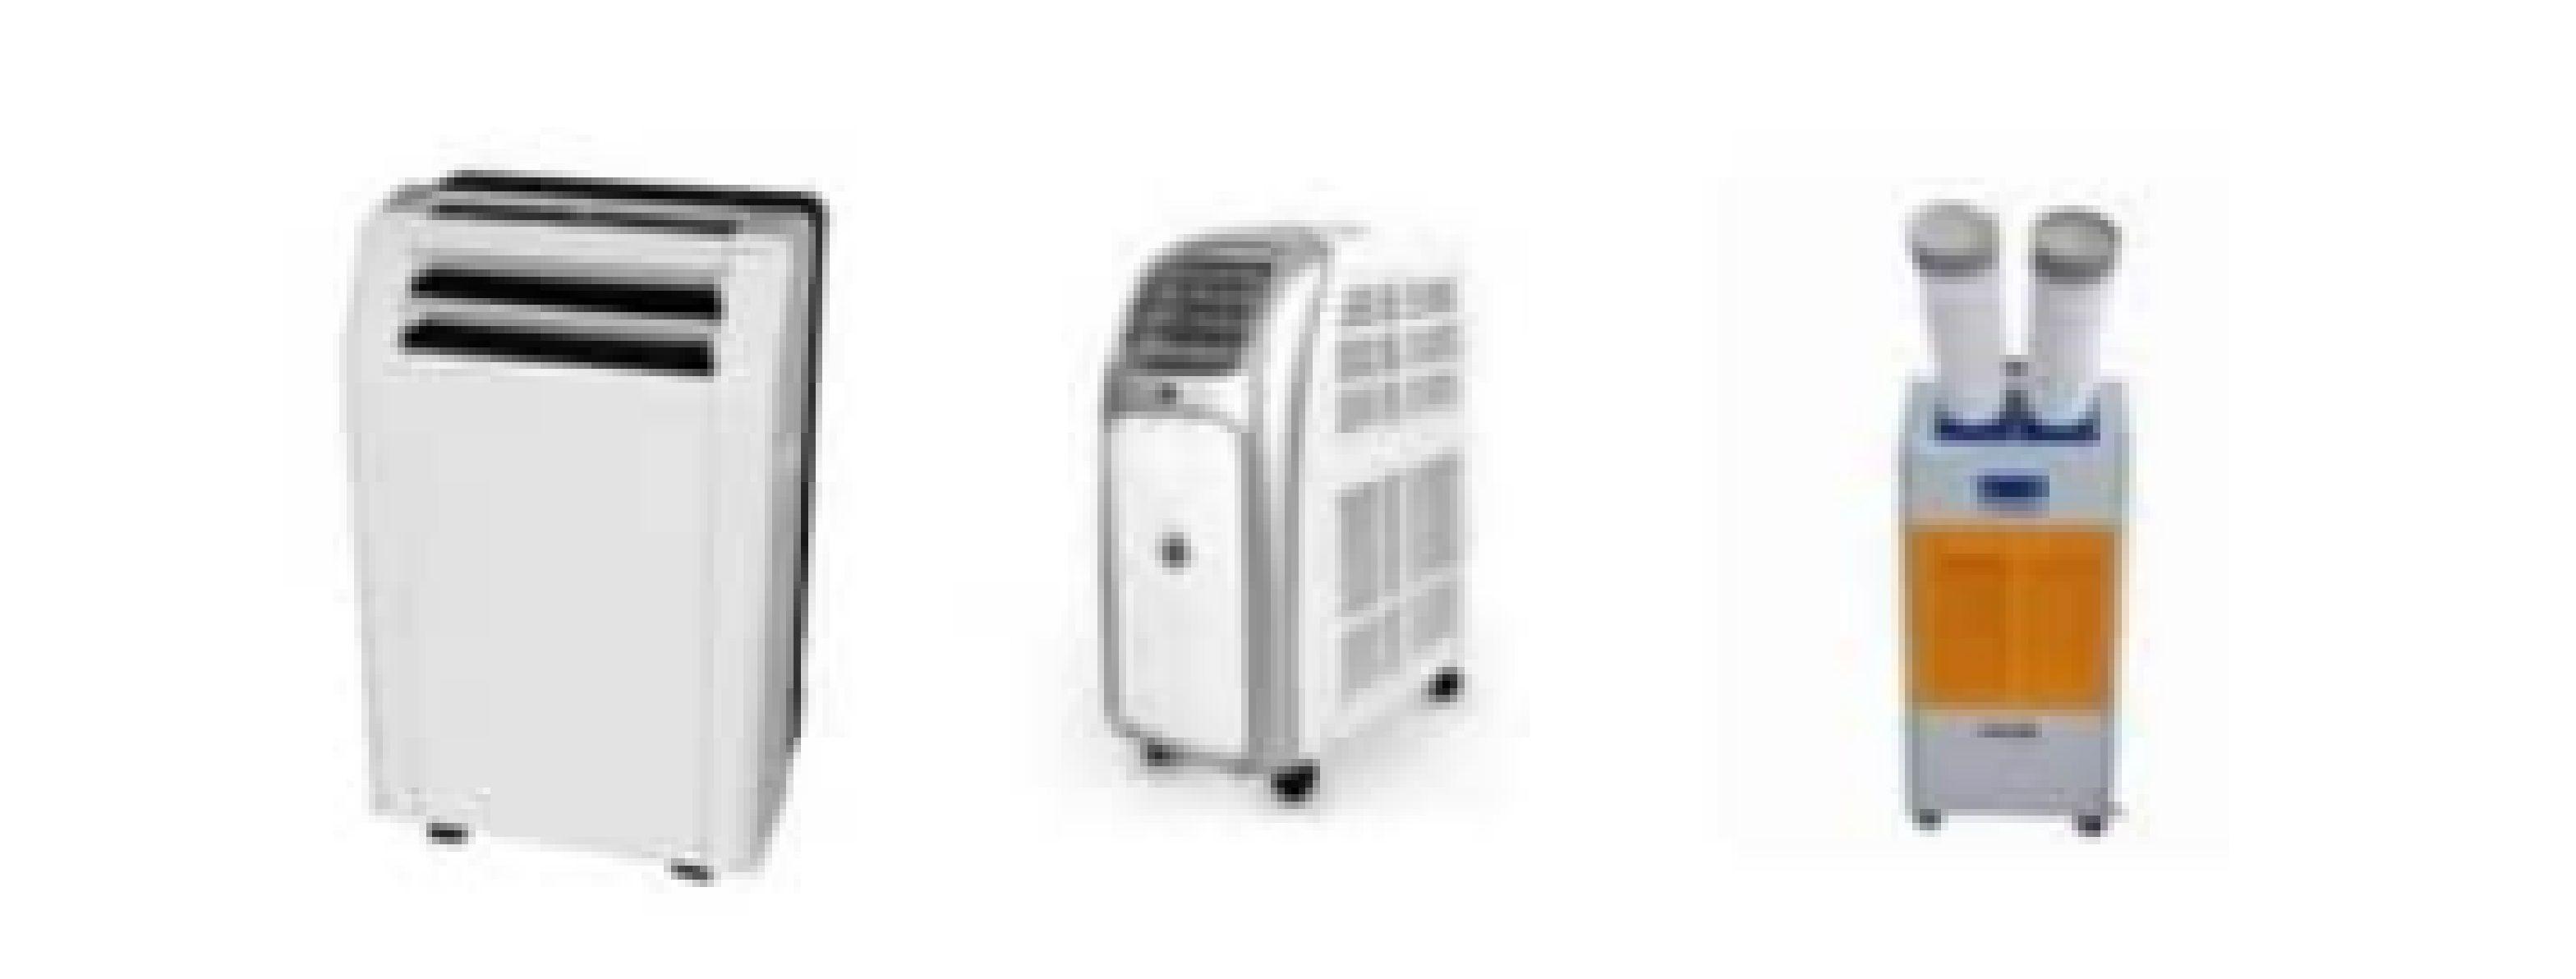 Portable Air Conditioners Portable air conditioner